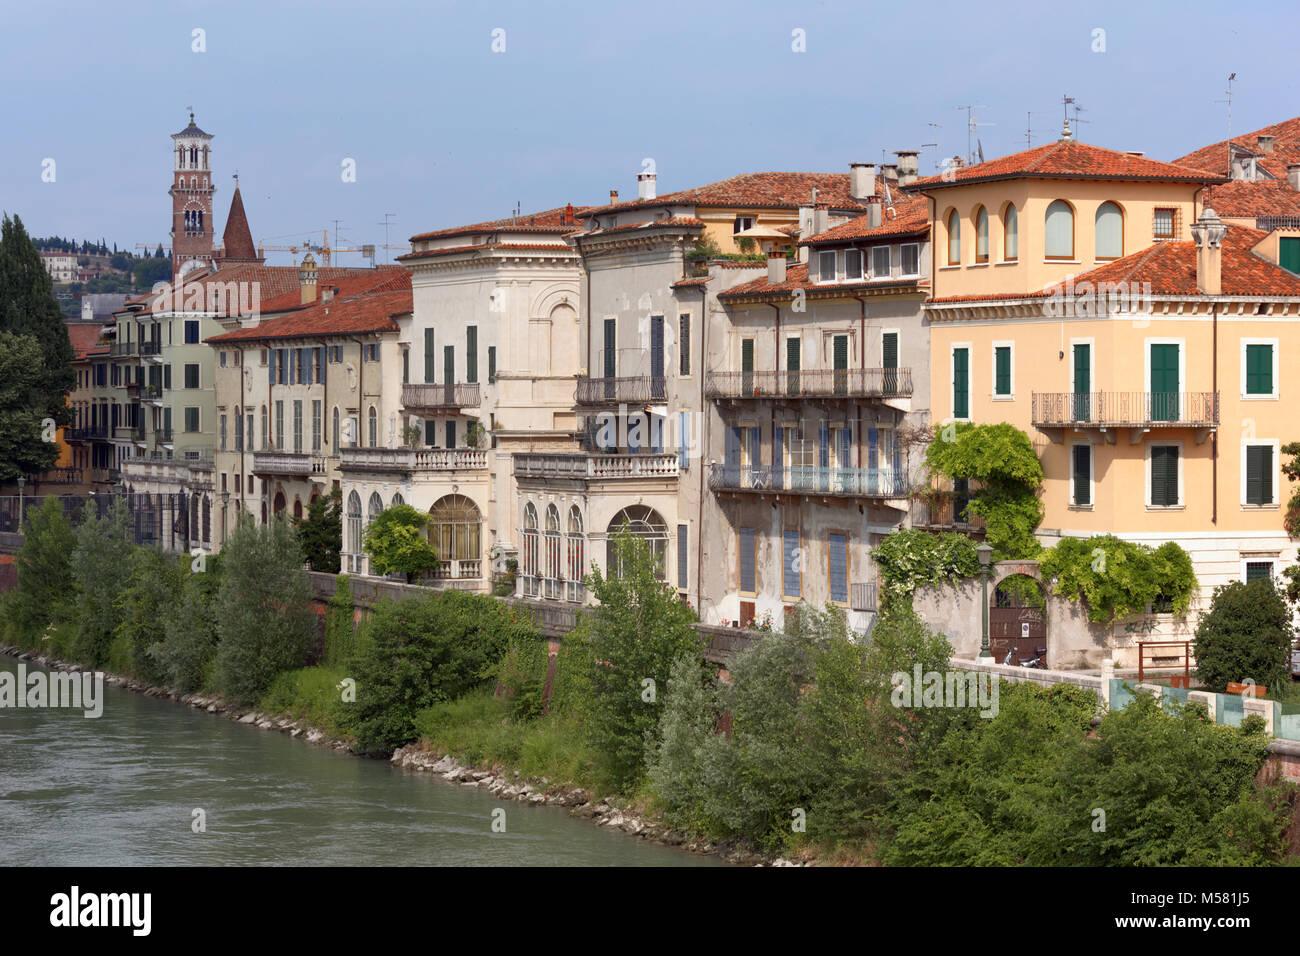 Embankment of Adige river in Verona, Italy - Stock Image